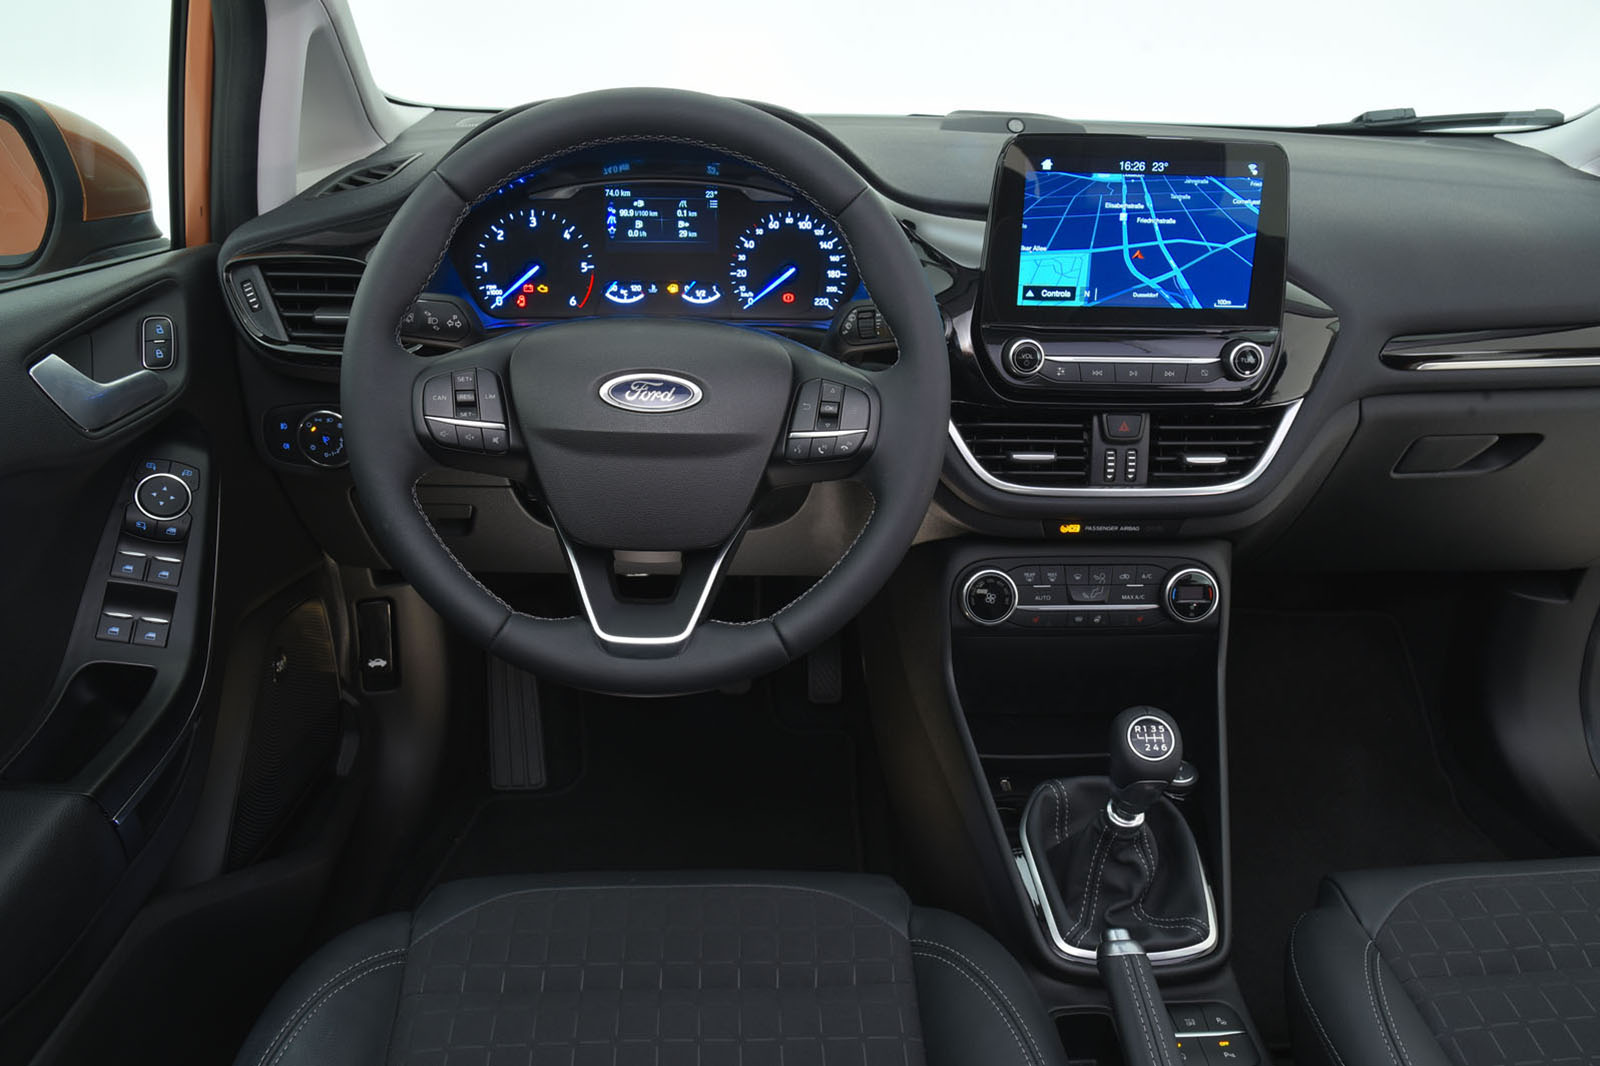 2017 Ford Fiesta Pricing Announced Autocar